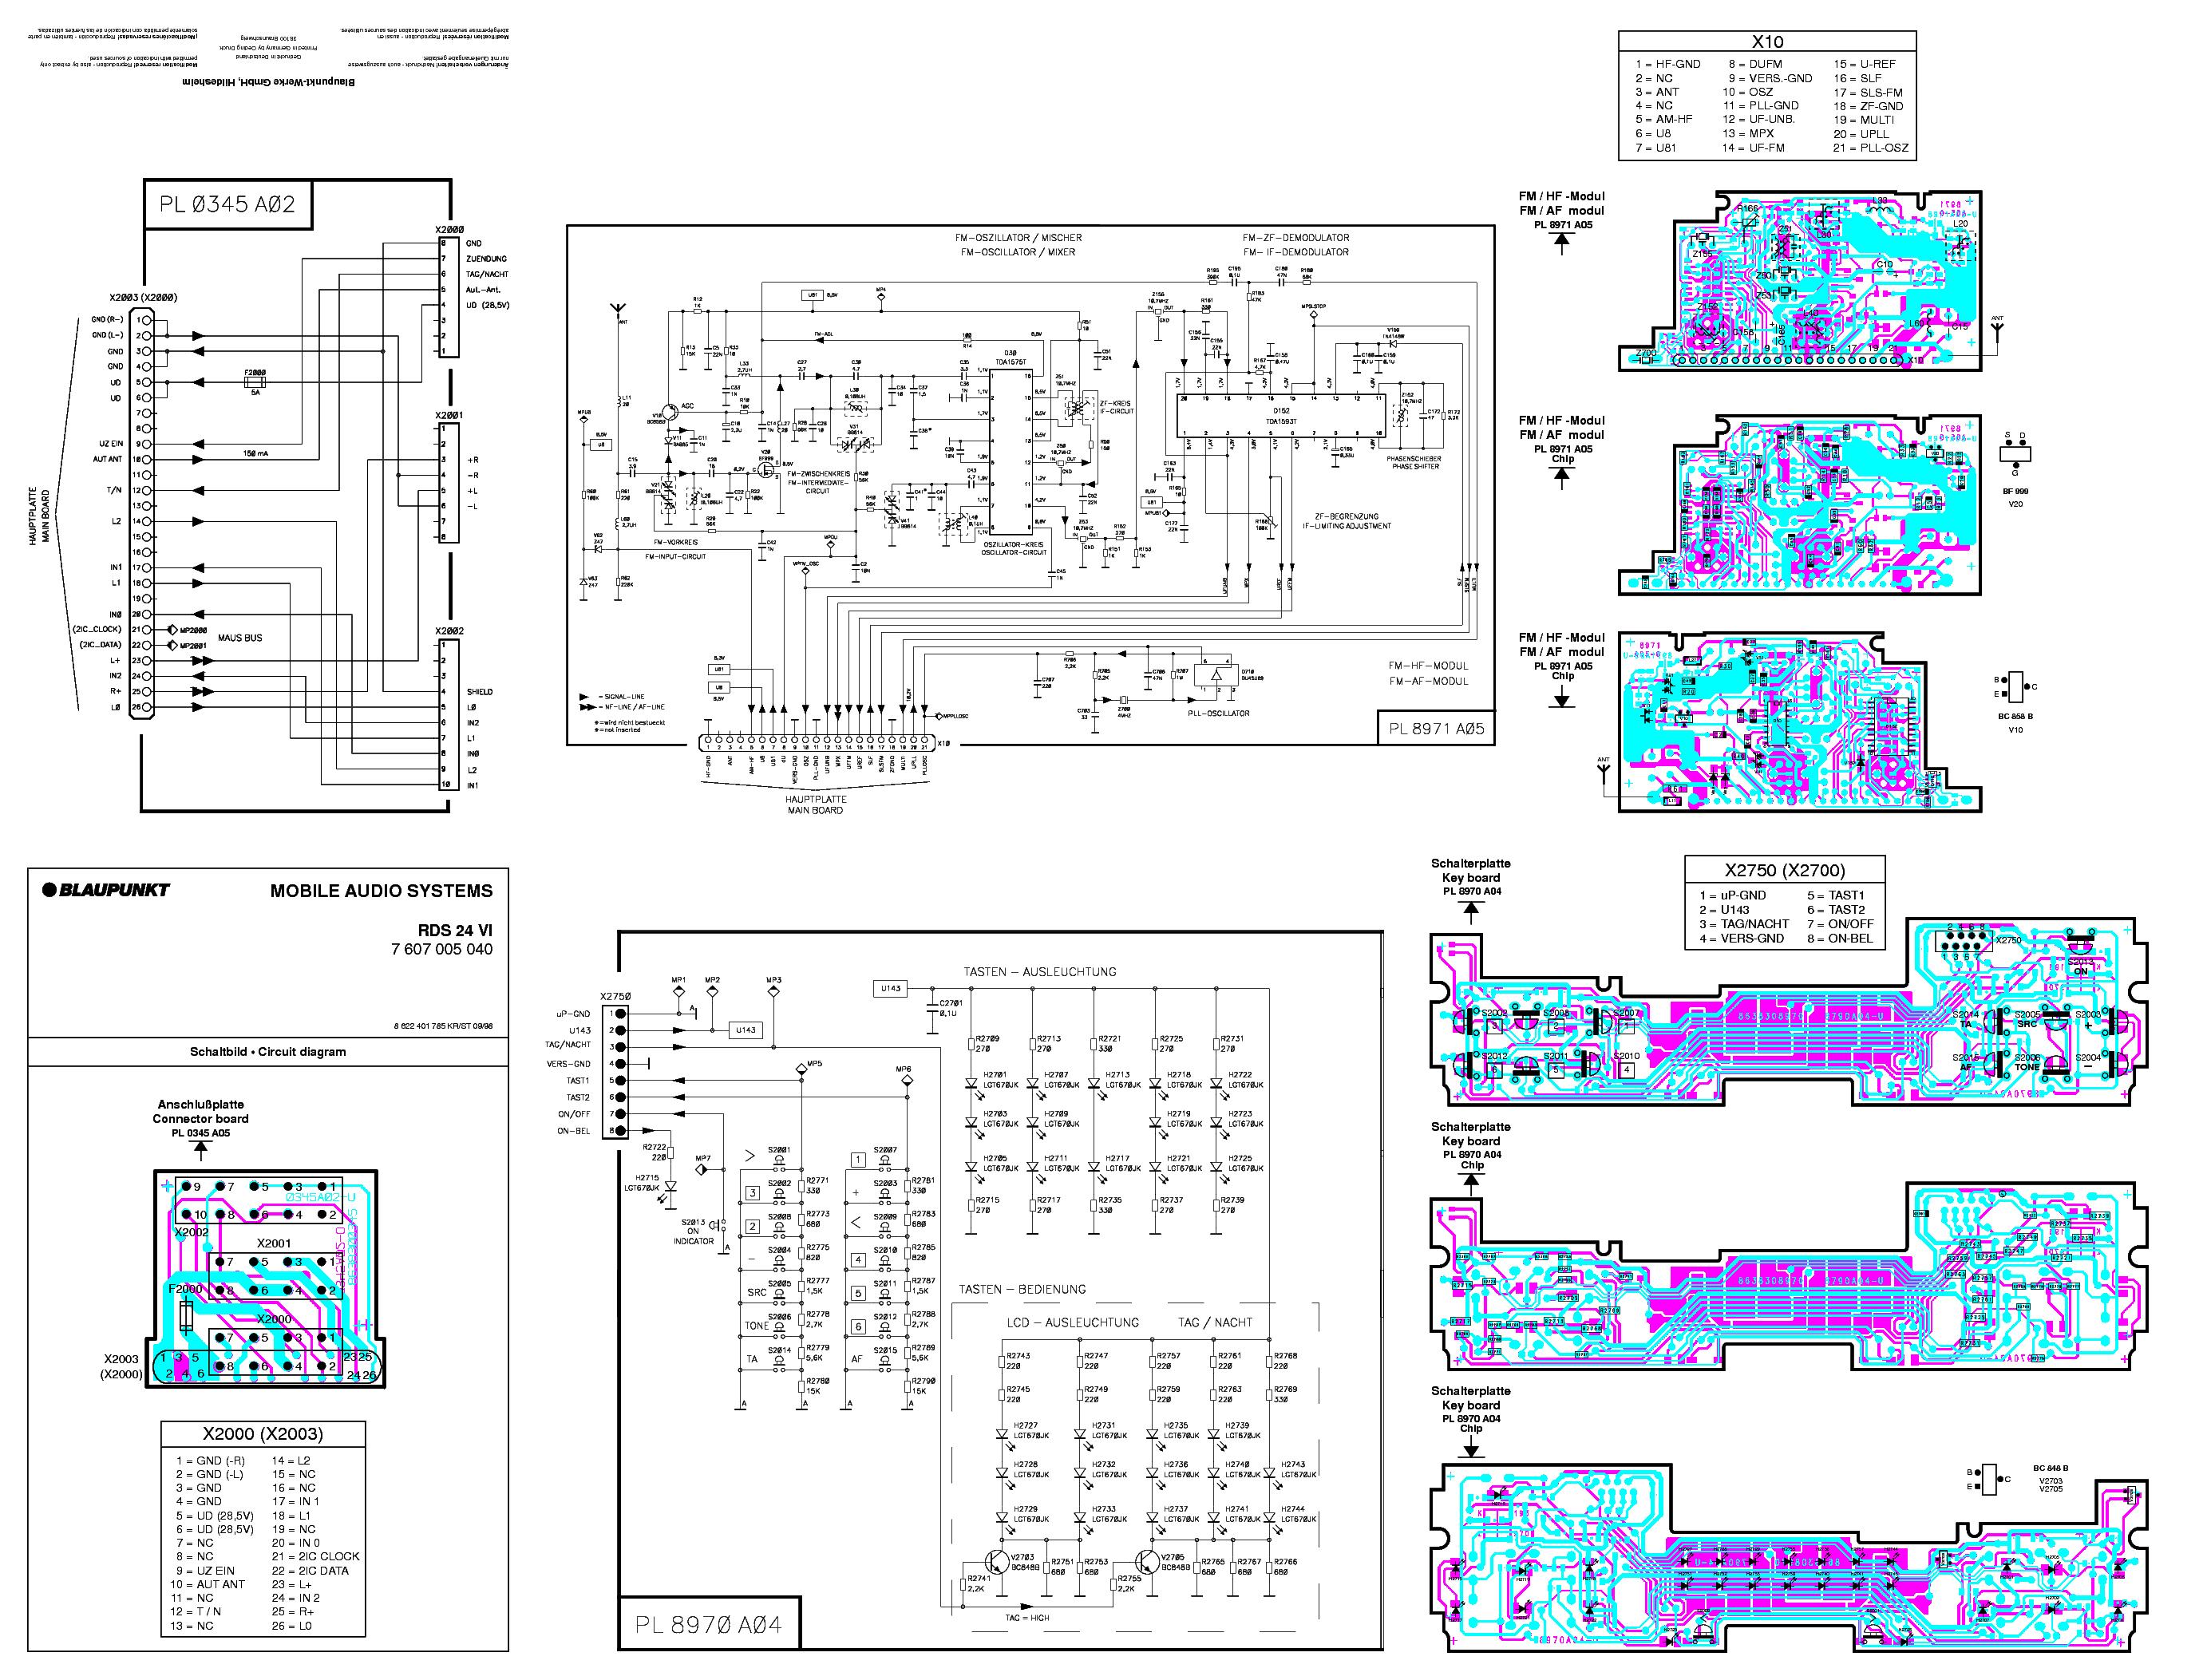 BLAUPUNKT RENAULT-RDS-24VI service manual (1st page)